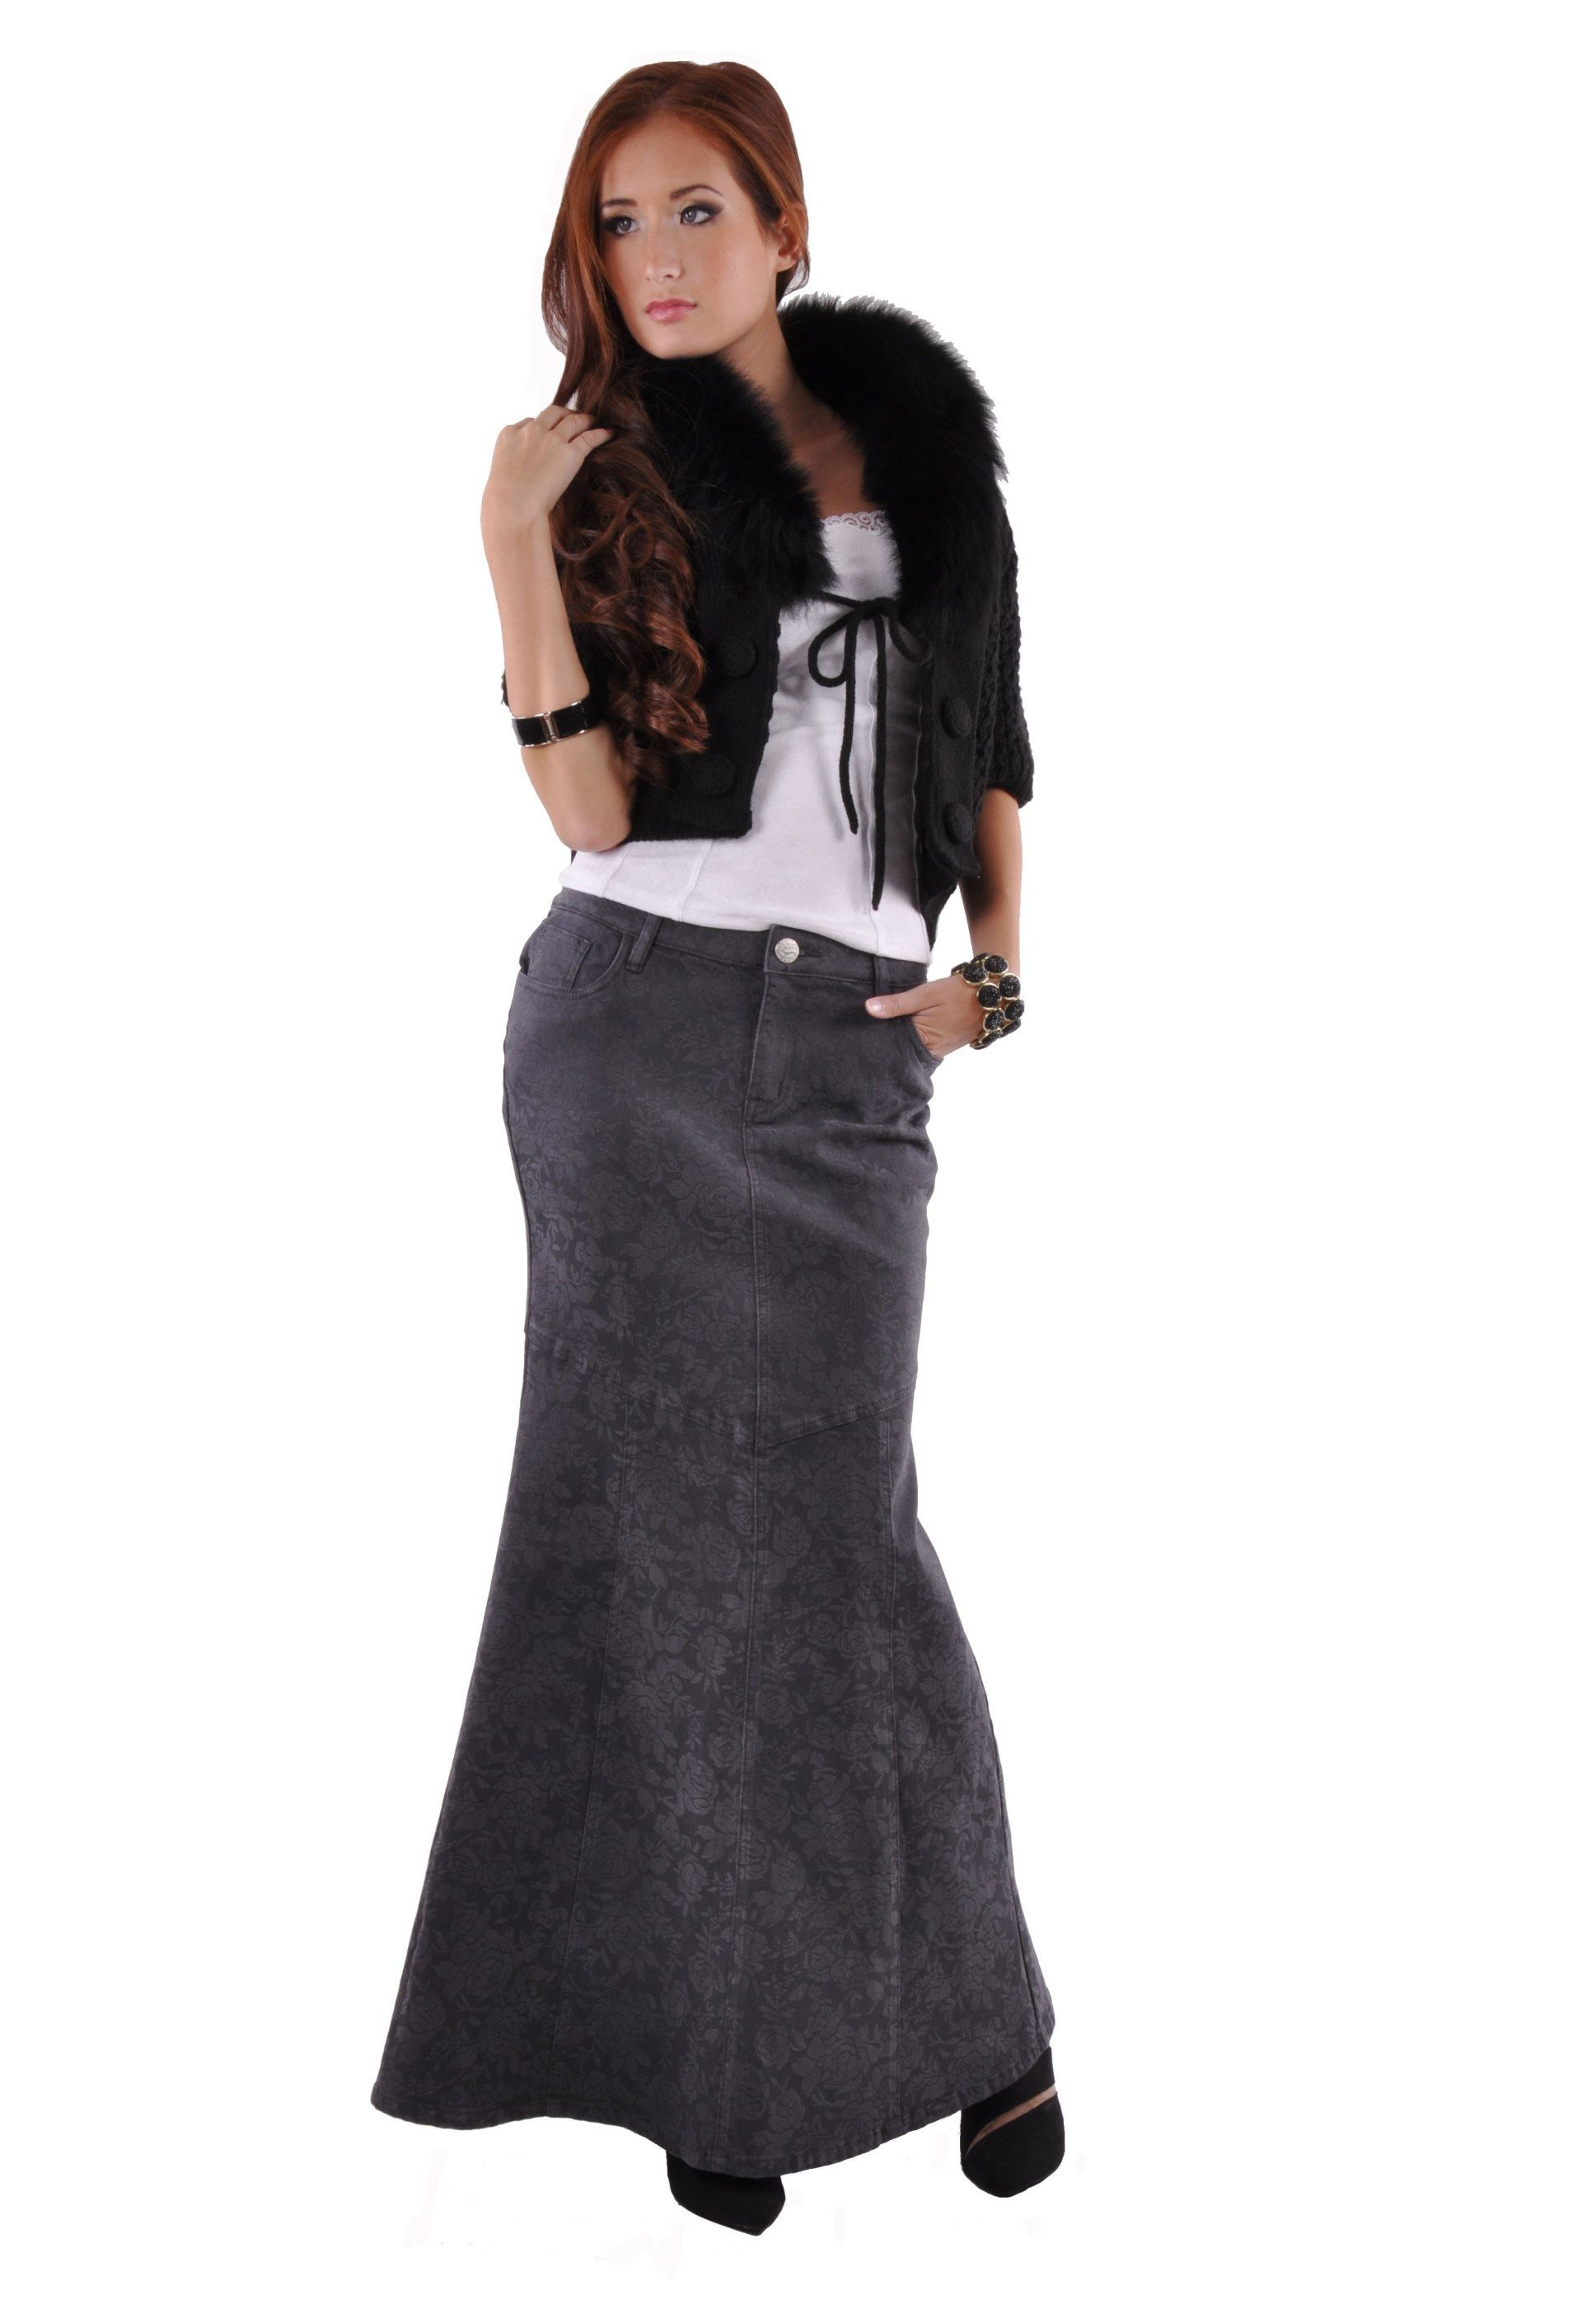 5564c0c9de Rosie Chic Long Denim Skirt | My Style | Denim skirt, Skirts, Plus ...